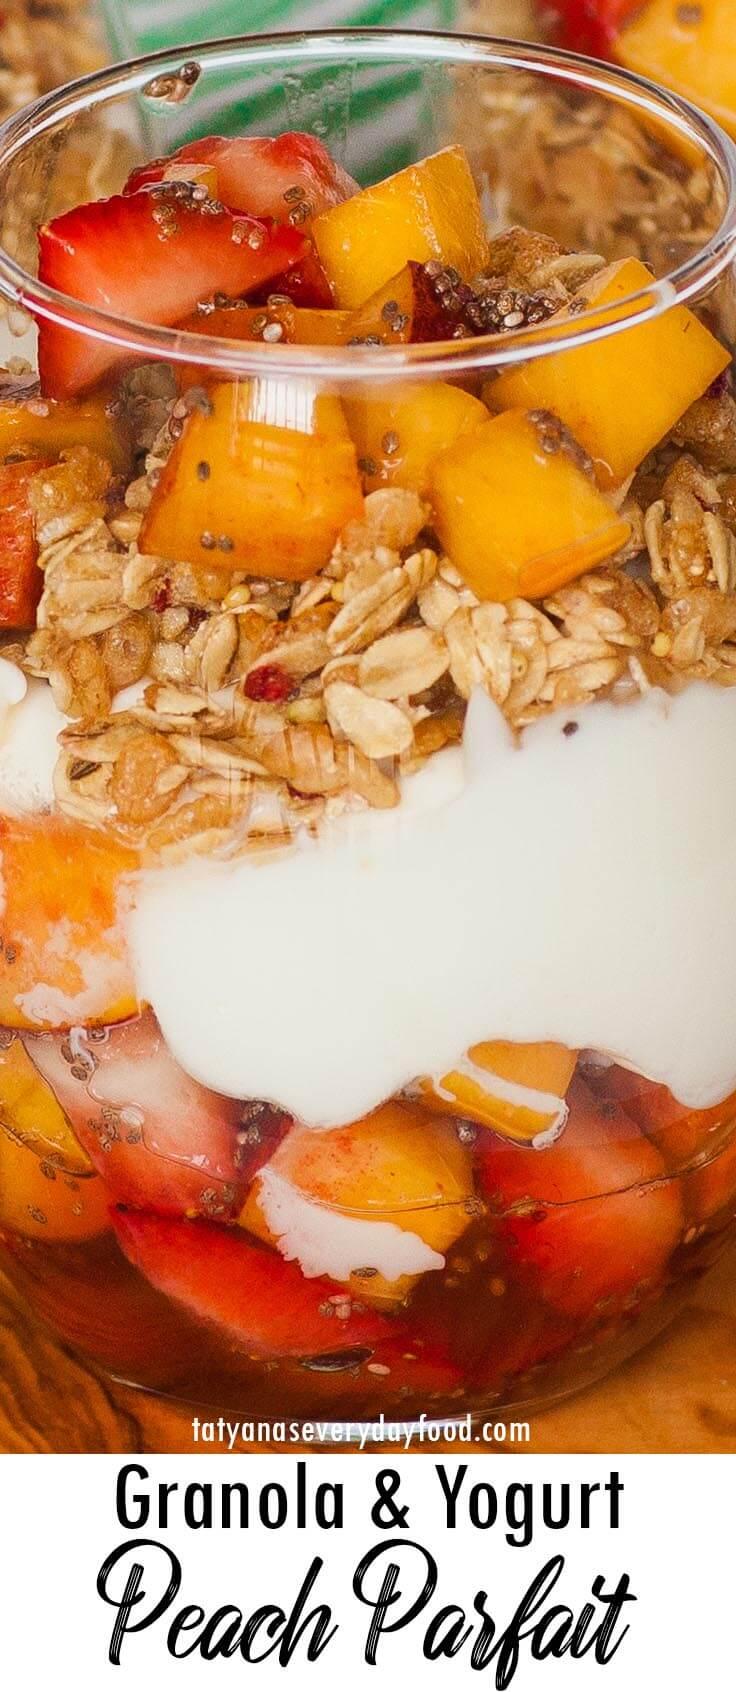 Granola & Peach Yogurt Parfait video recipe